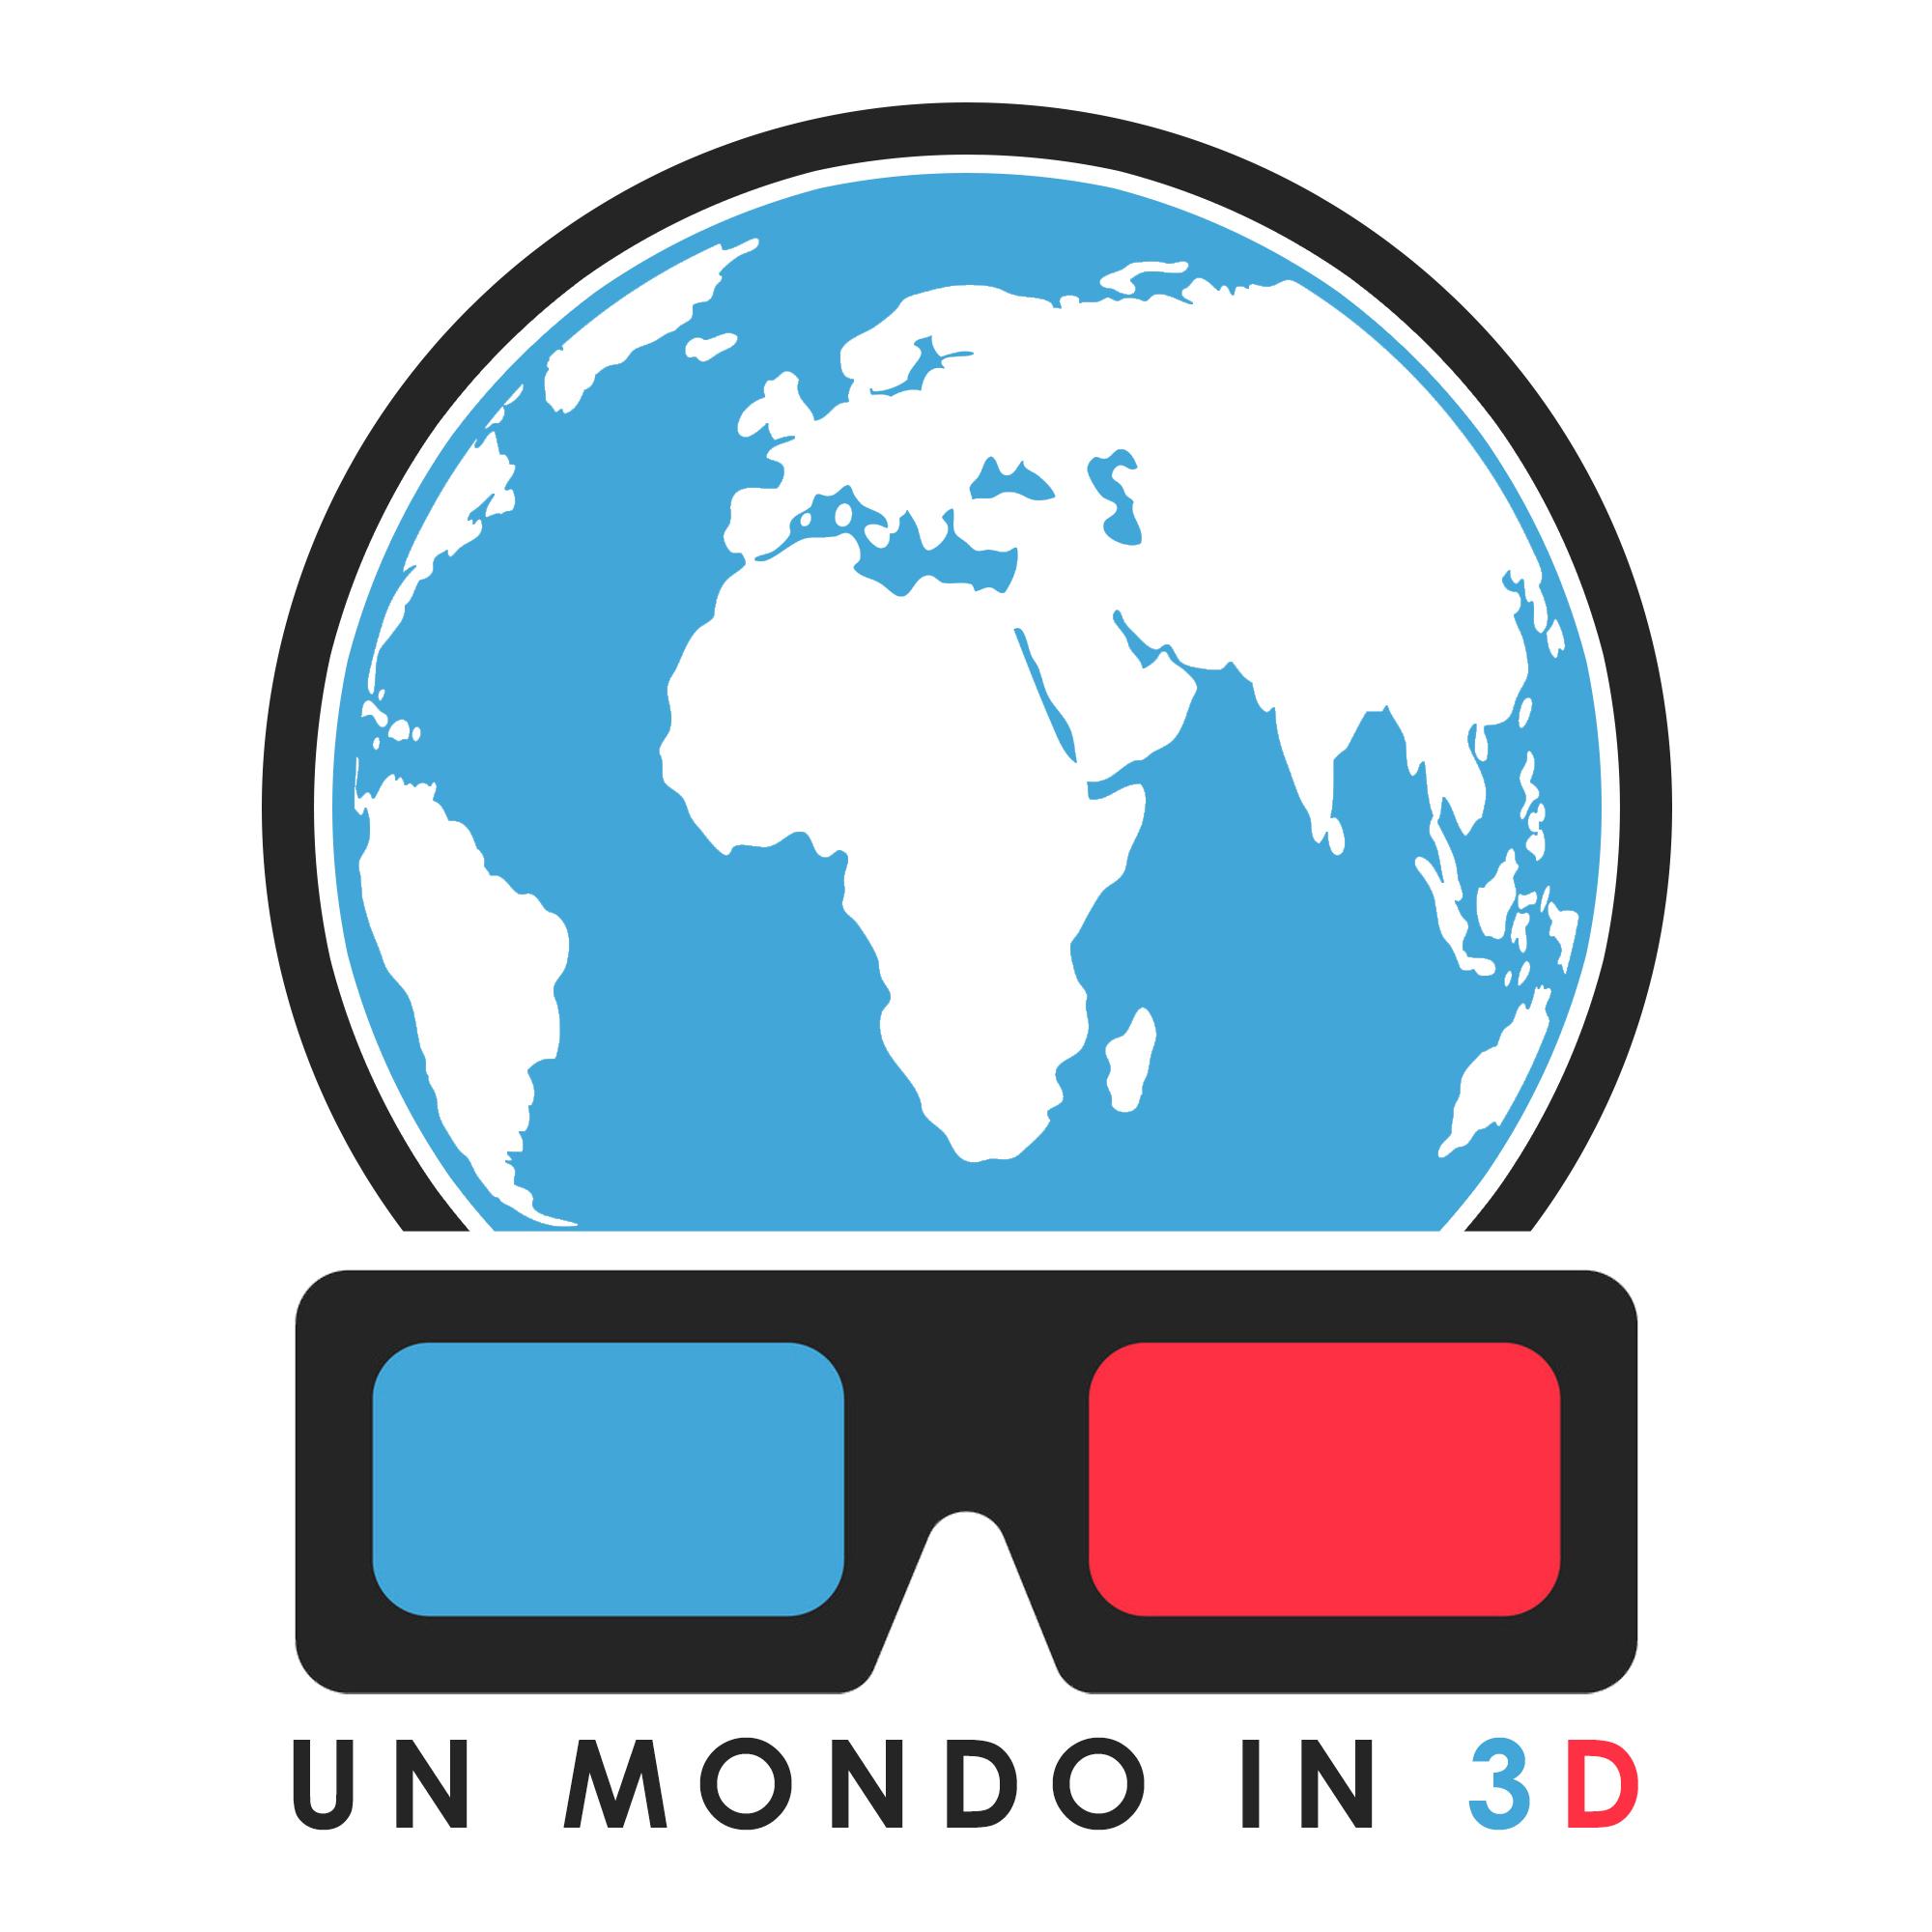 Un Mondo in 3D